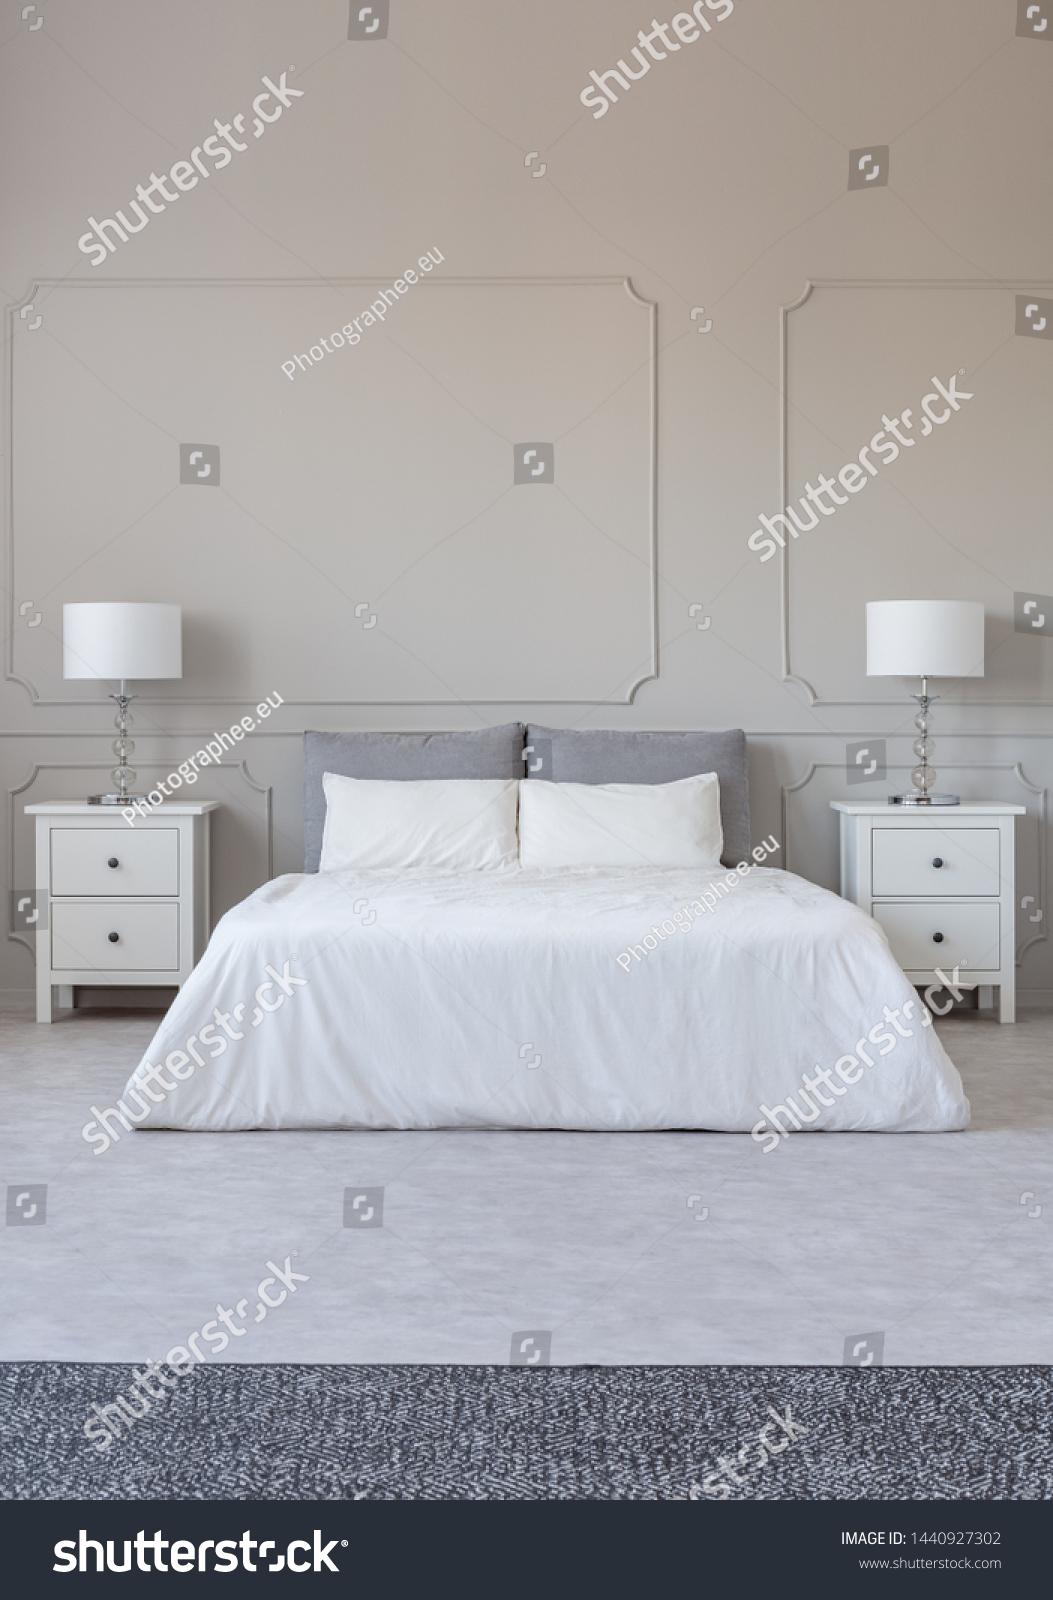 New York Style Bedroom Interior Symmetric | Royalty-Free ...